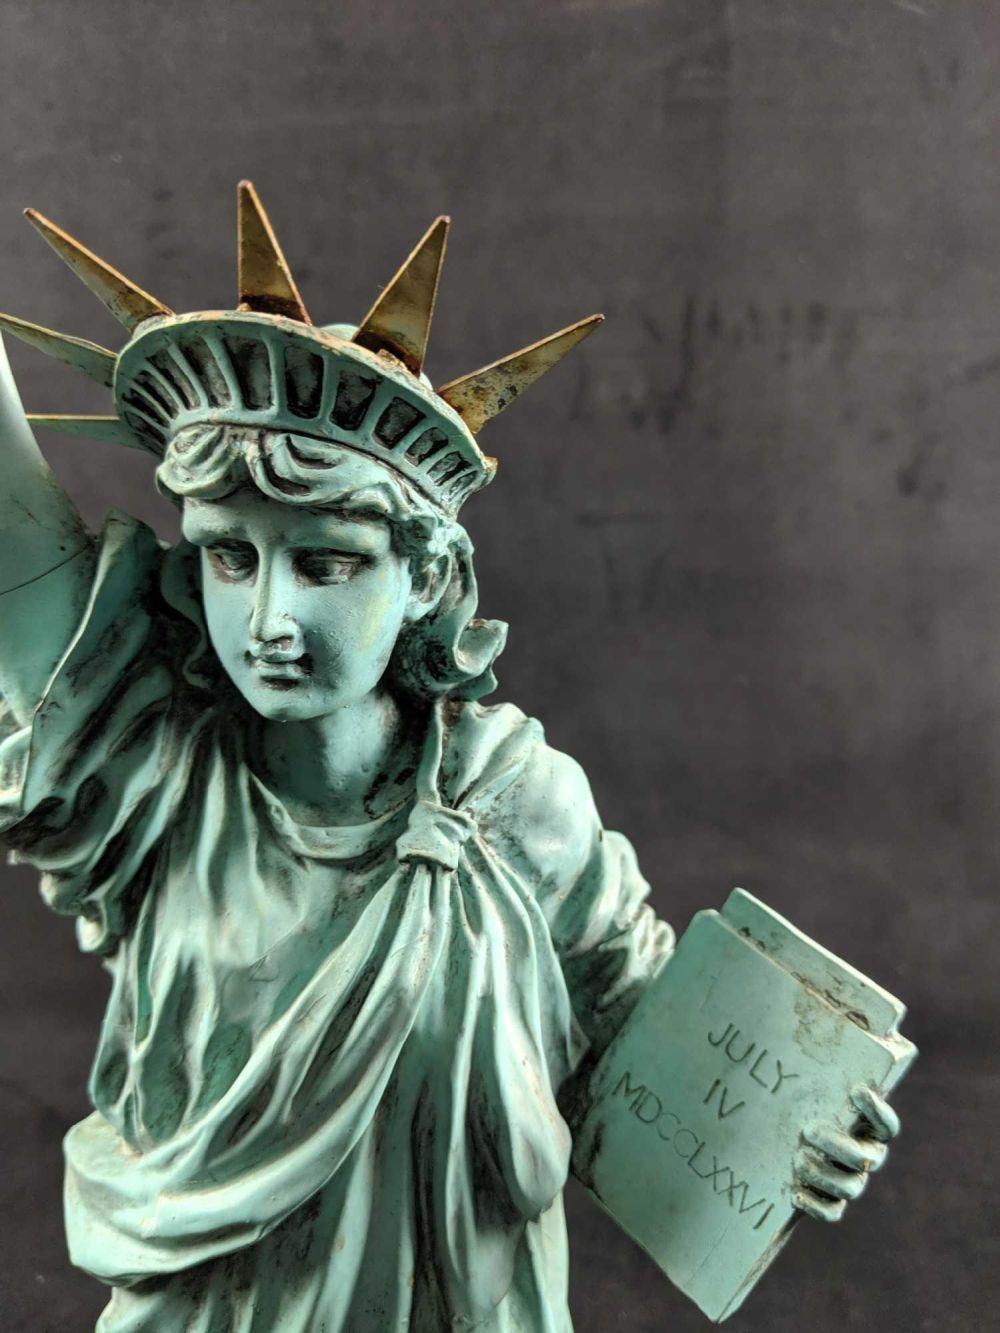 Lot 474: 1986 Liberty Centennial Statue Of Liberty Lawn Sprinkler